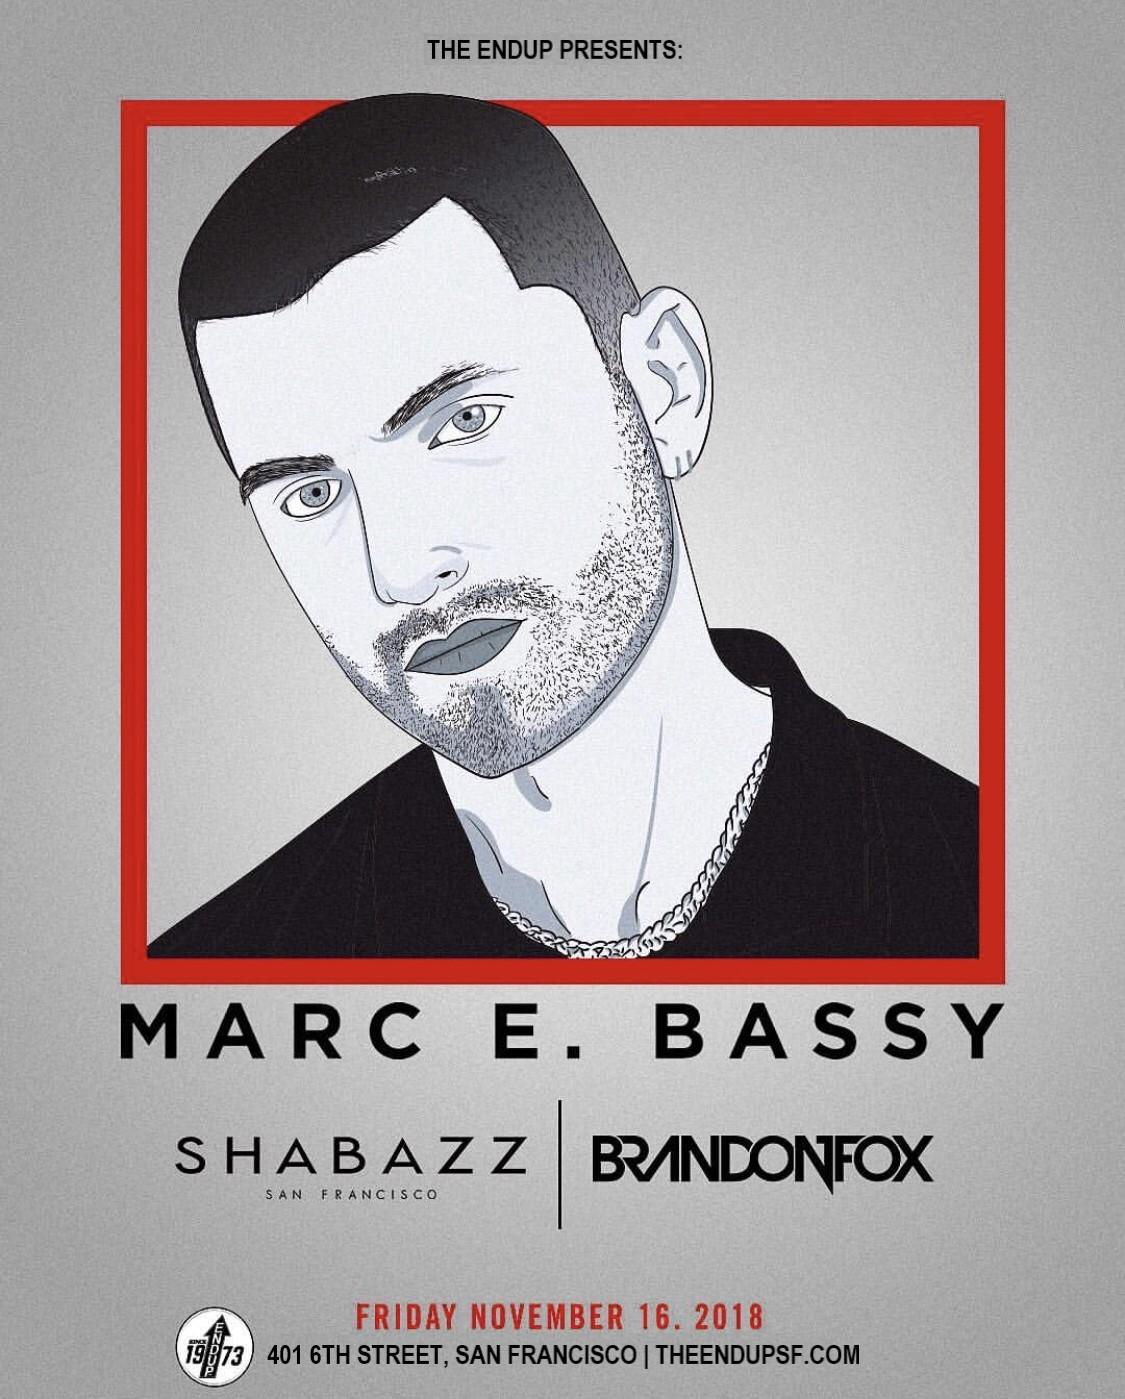 Marc E. Bassy